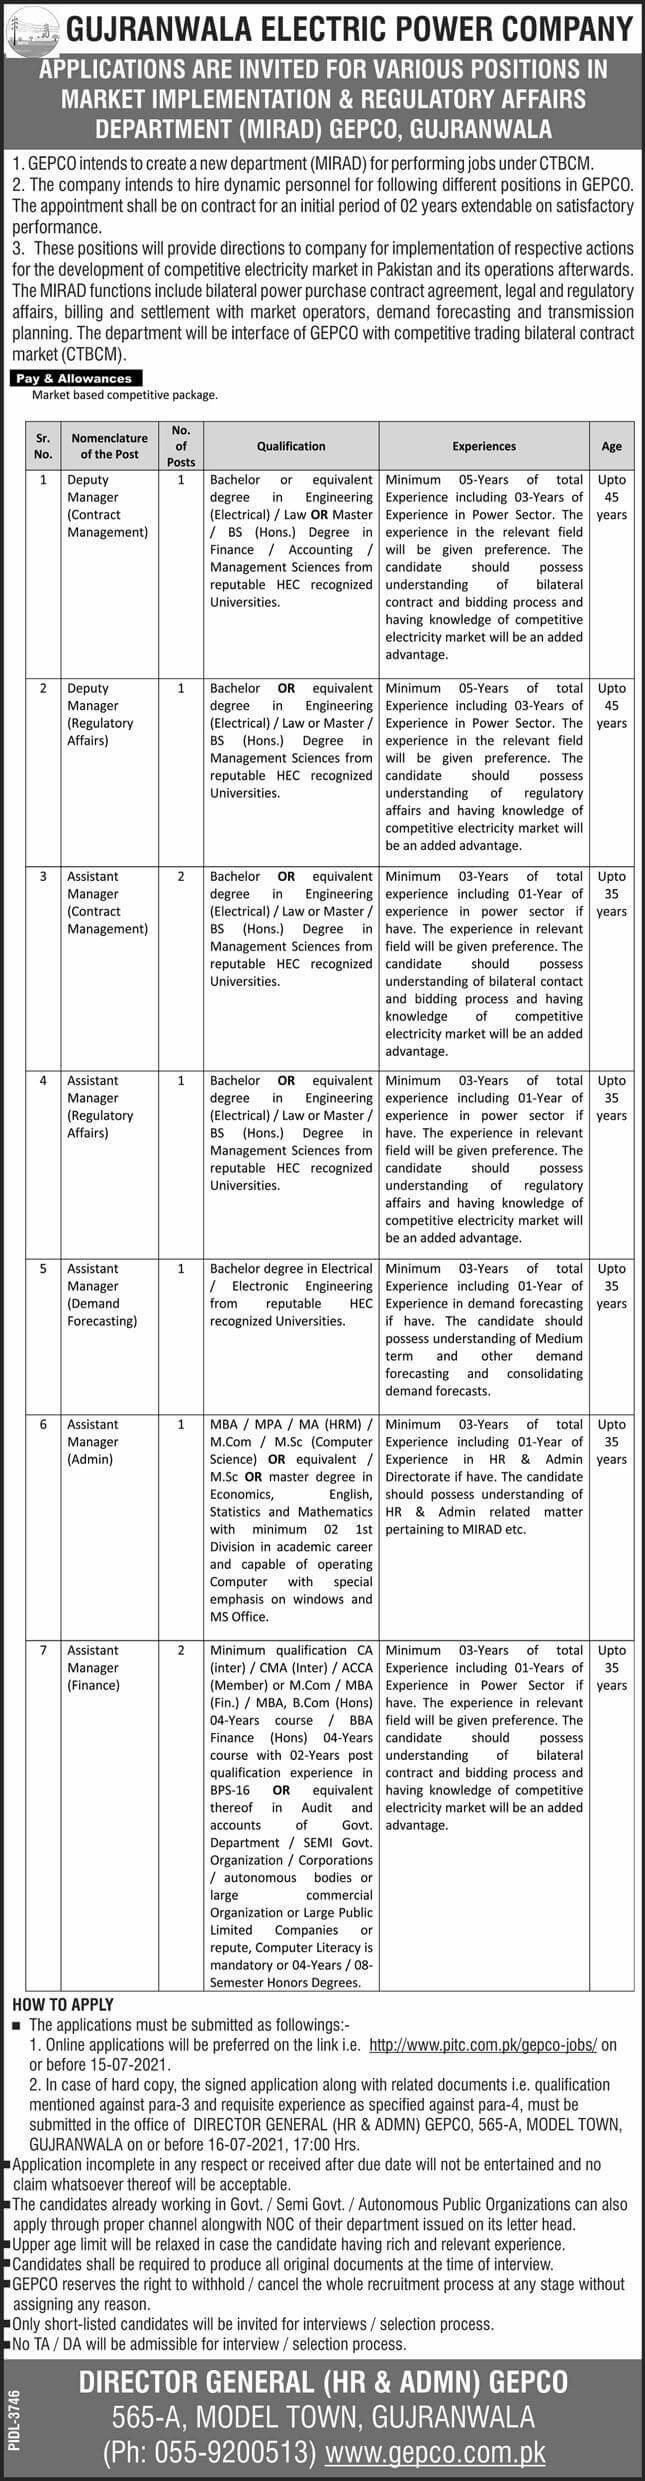 GEPCO Jobs 2021 Gujranwala Electric Power Company pitc.com.pk